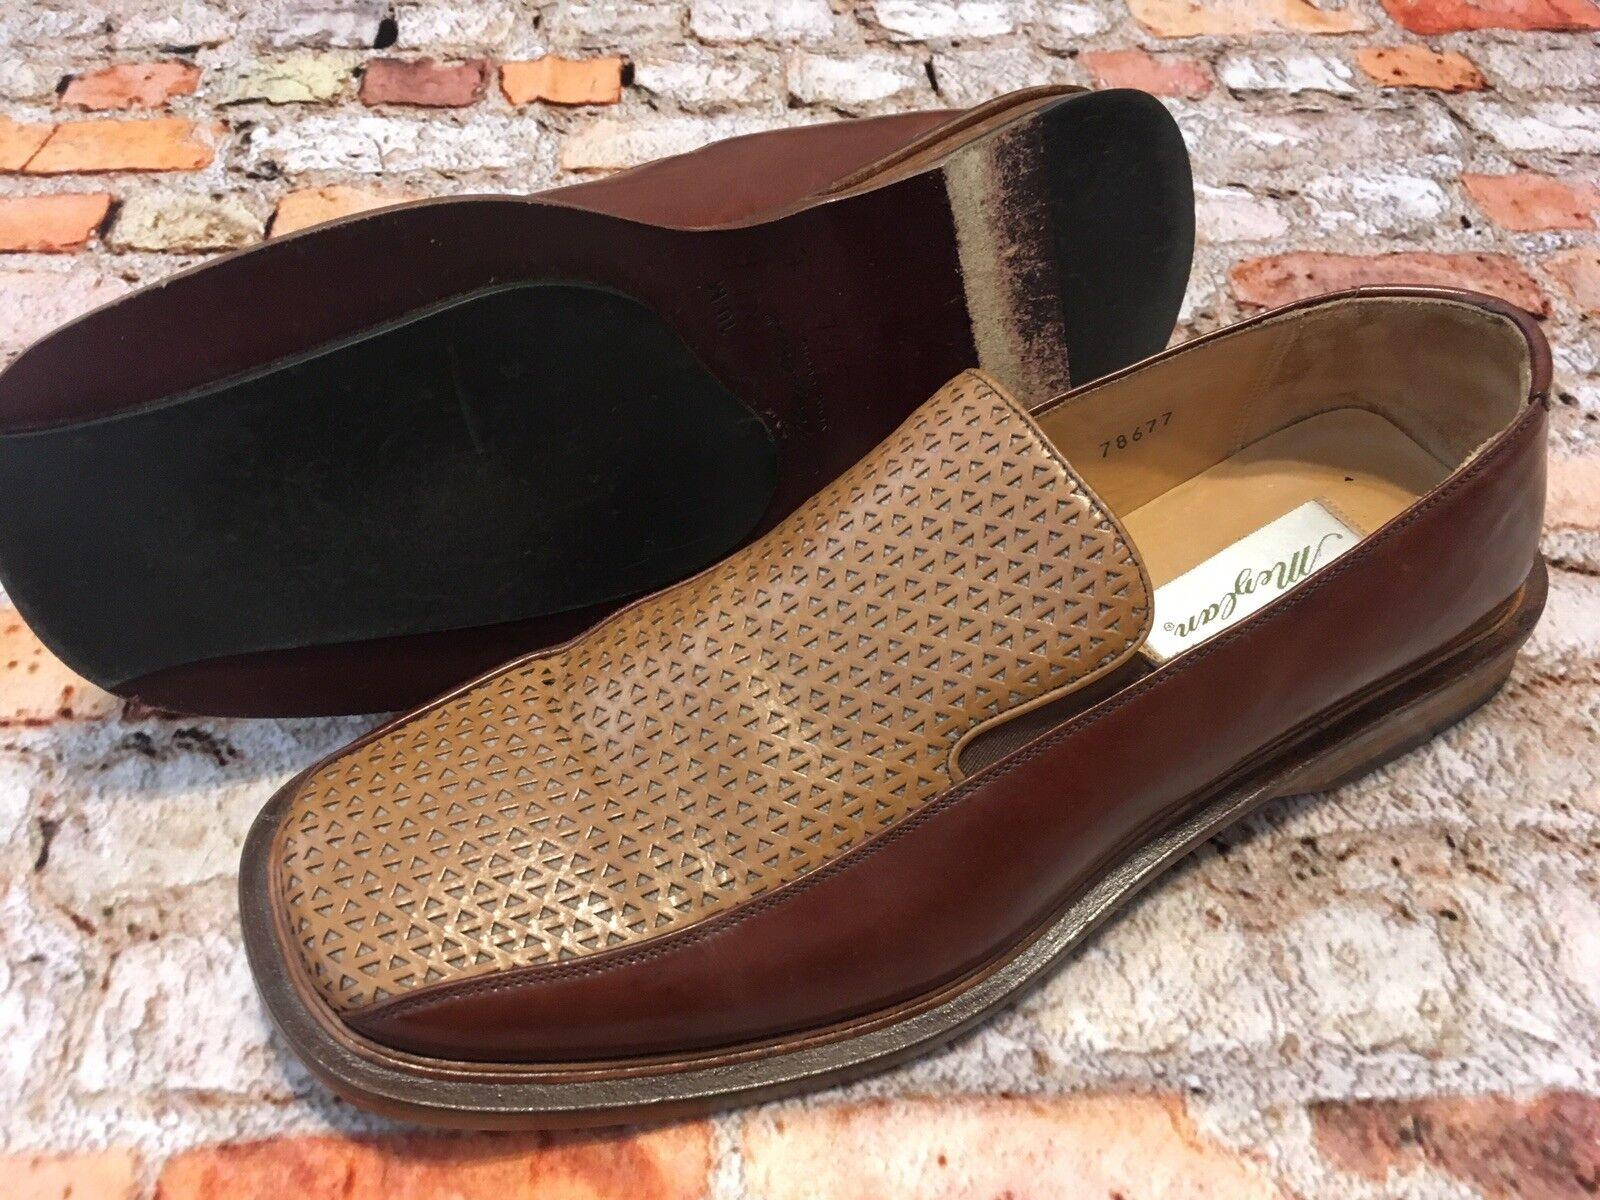 MEZLAN Brown Tan Leather Loafer SHOES SPAIN VERO CUOIO Men's Size 10M